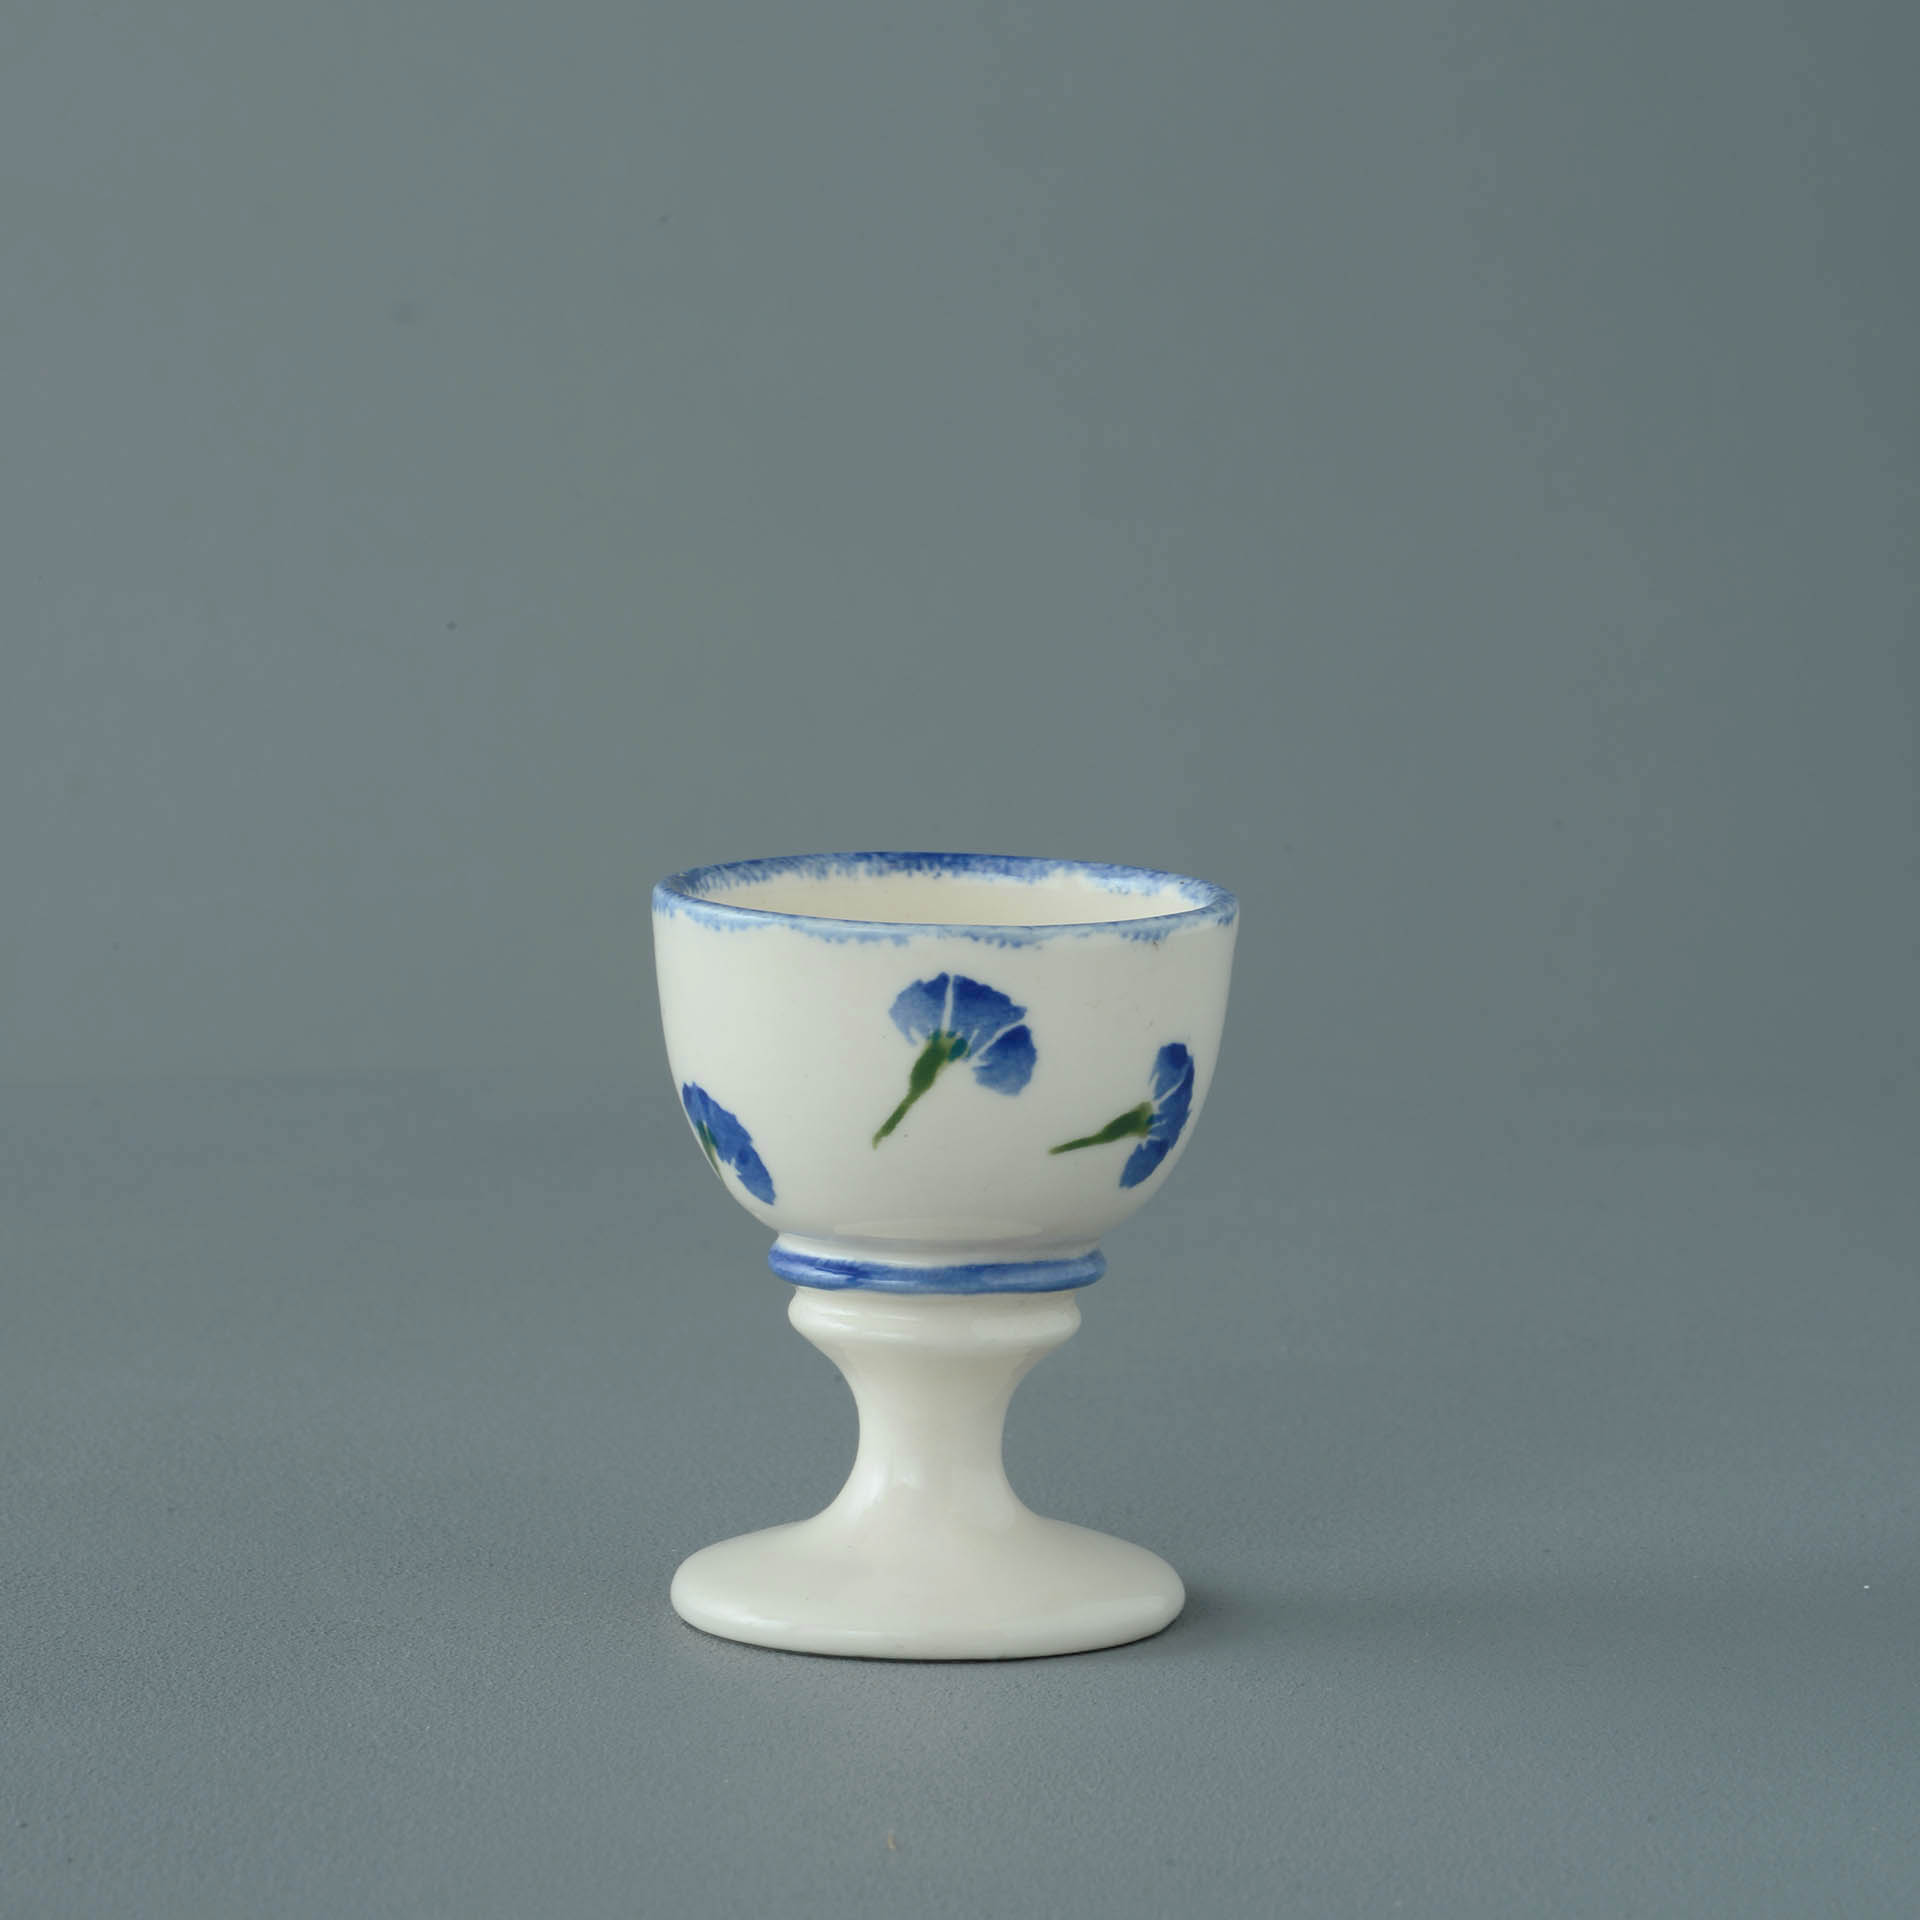 Cornflower Egg cup 6.3 x 5.2cm